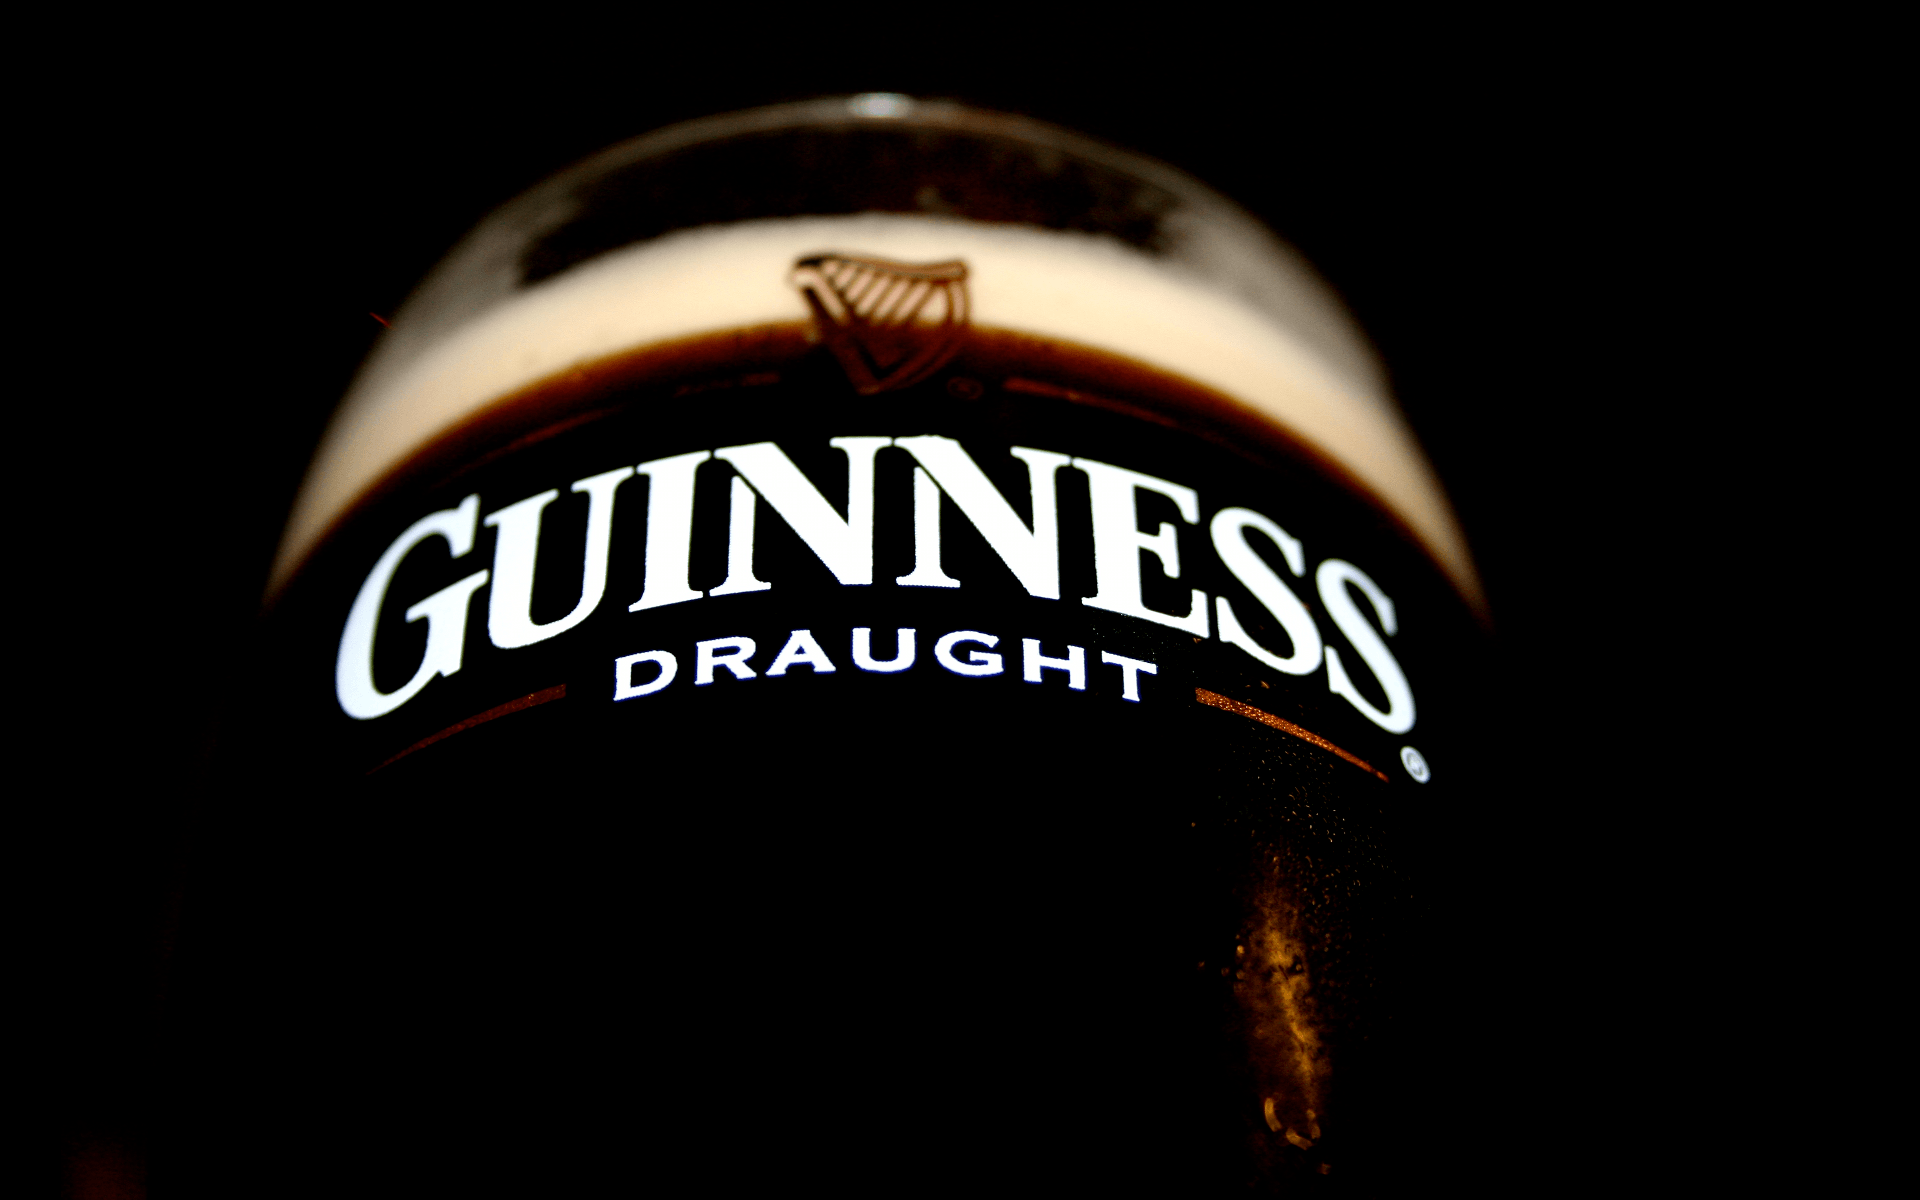 irish beer wallpaper hd - photo #1